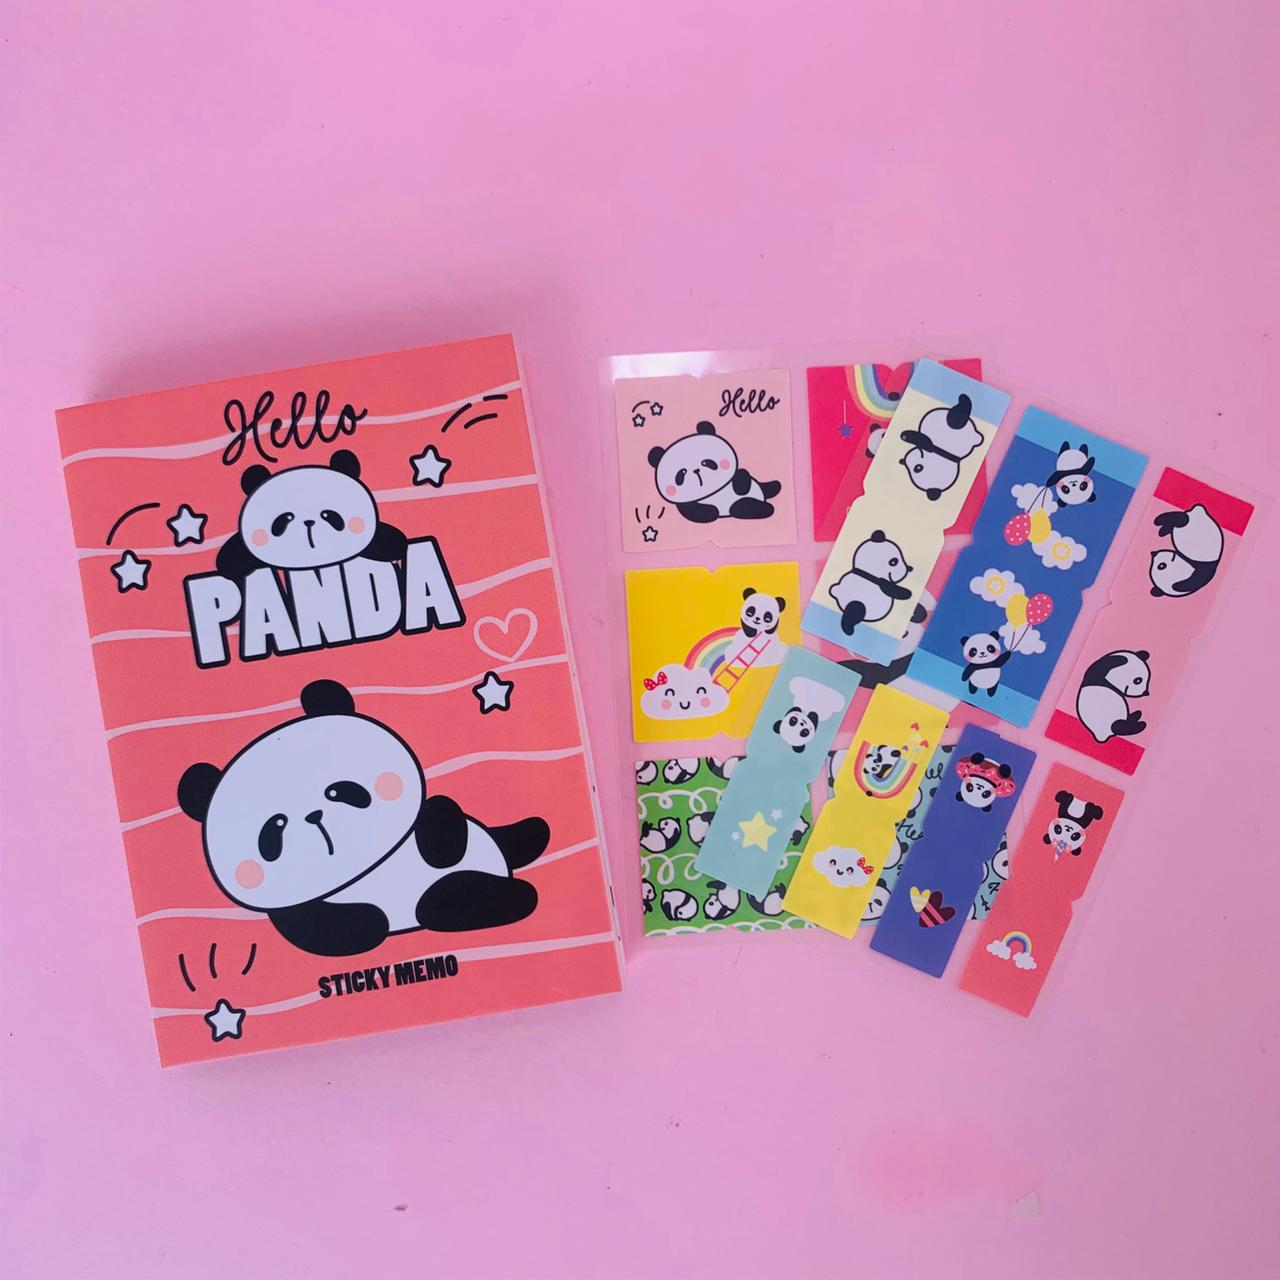 Bloco Adesivado Livrinho Decorativo Post it Panda | Importado